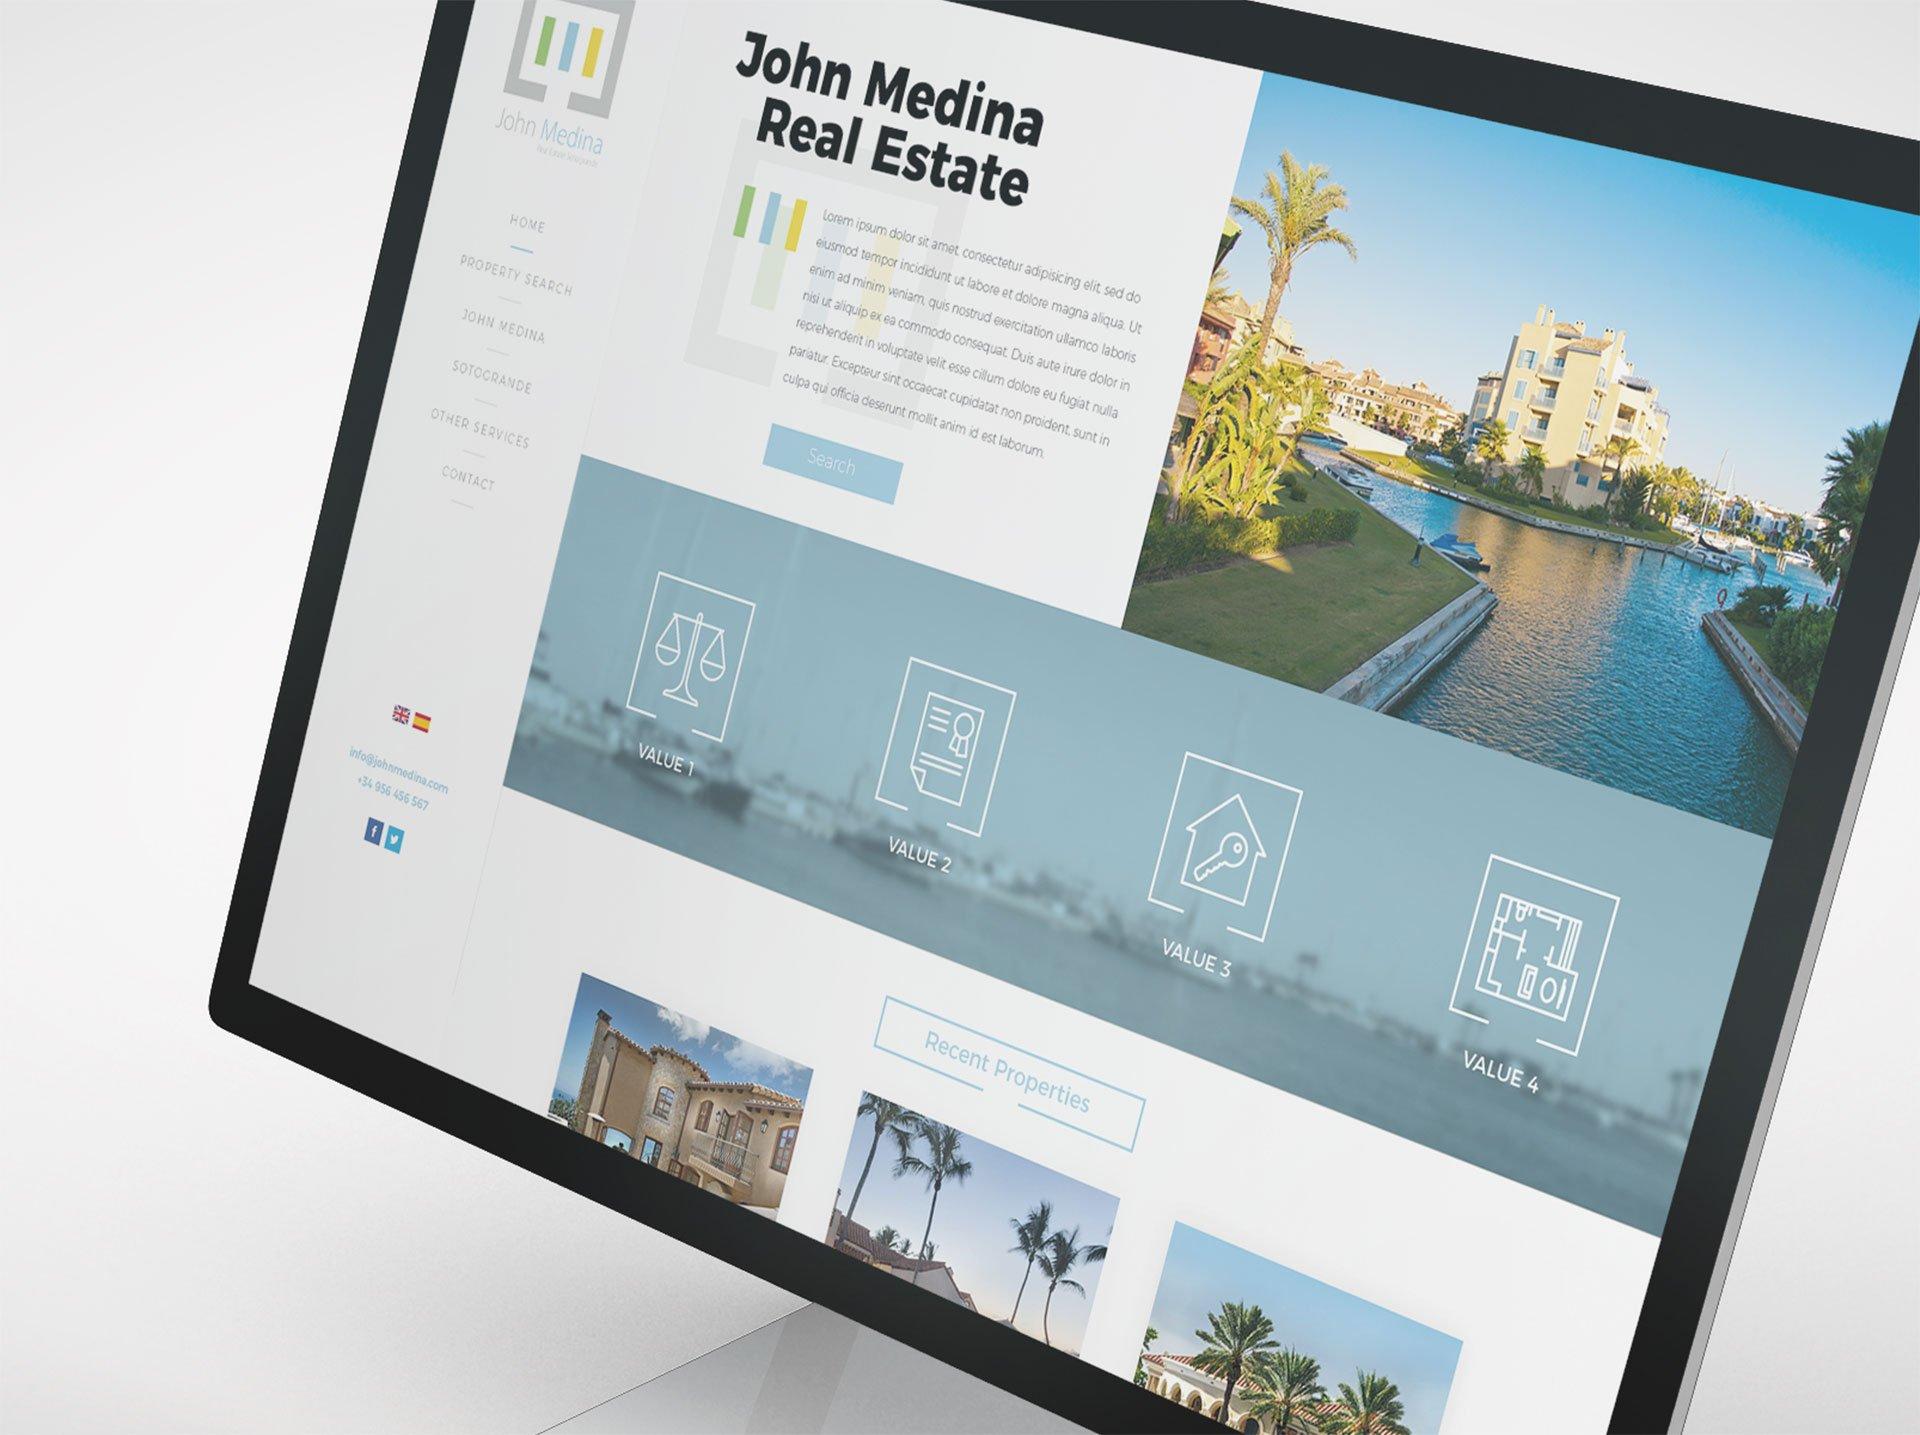 diseño-web-john-medina-agencia-adhoc